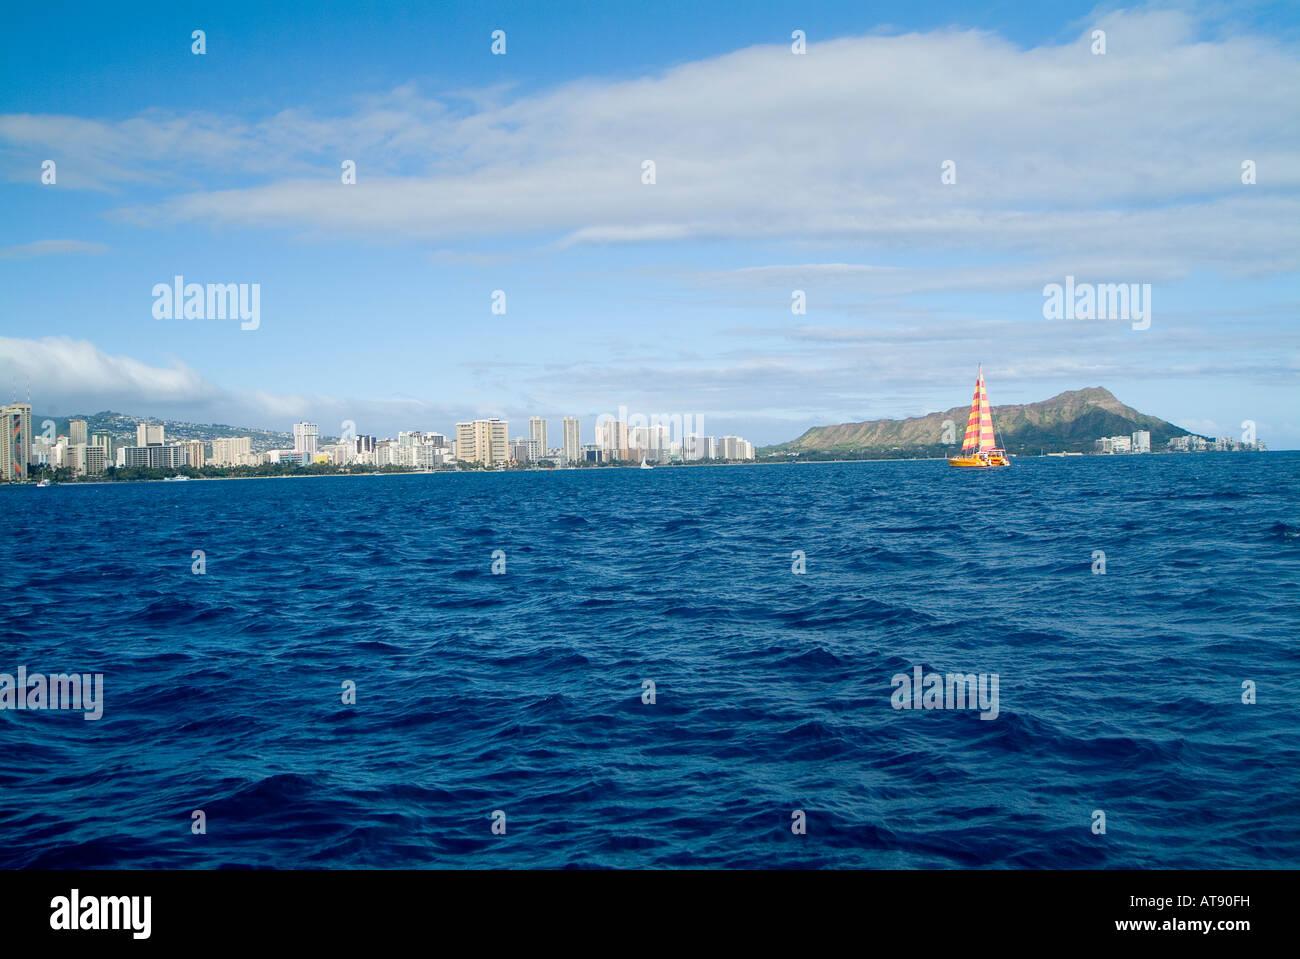 Wide angled shot of the Waikiki coastline from downtown Honolulu to Diamond Head shot from a sailboat off Waikiki. Stock Photo